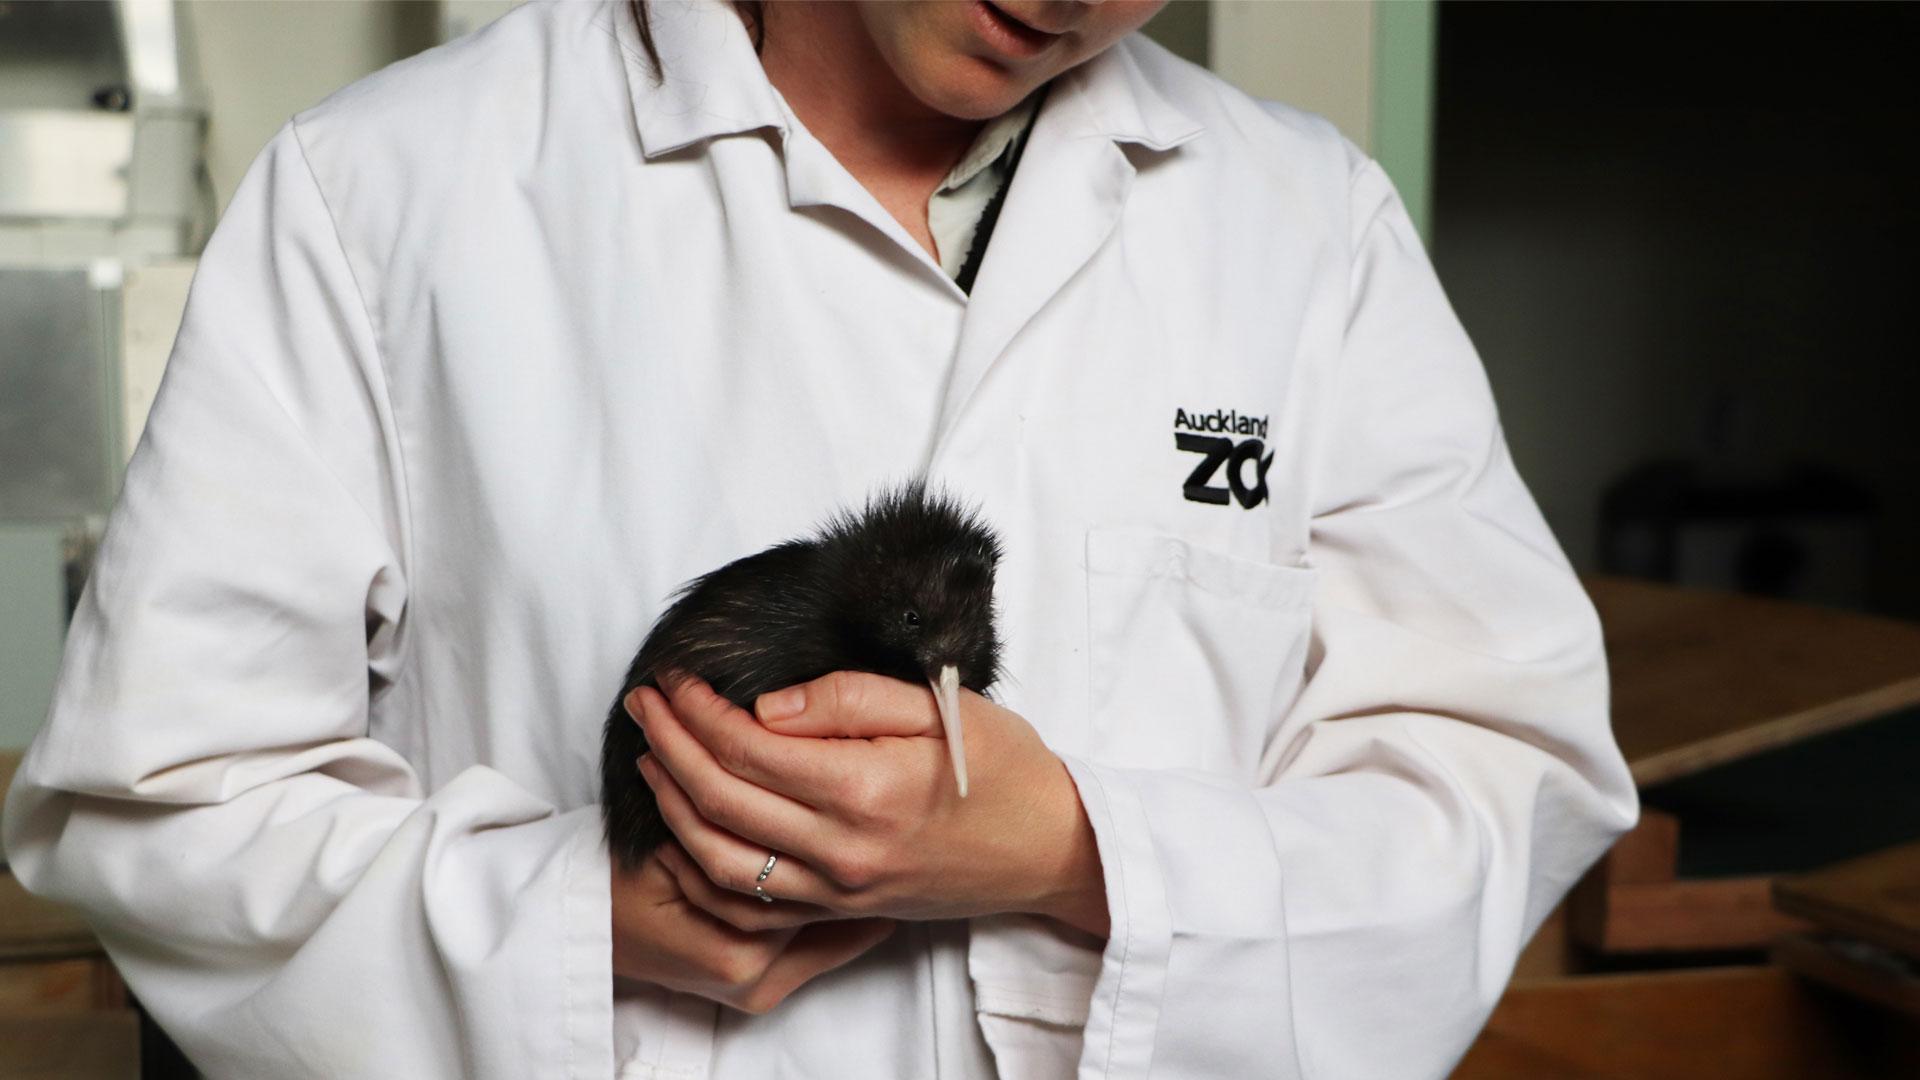 https://rfacdn.nz/zoo/assets/media/kiwi-chick-2020-gallery-11.jpg